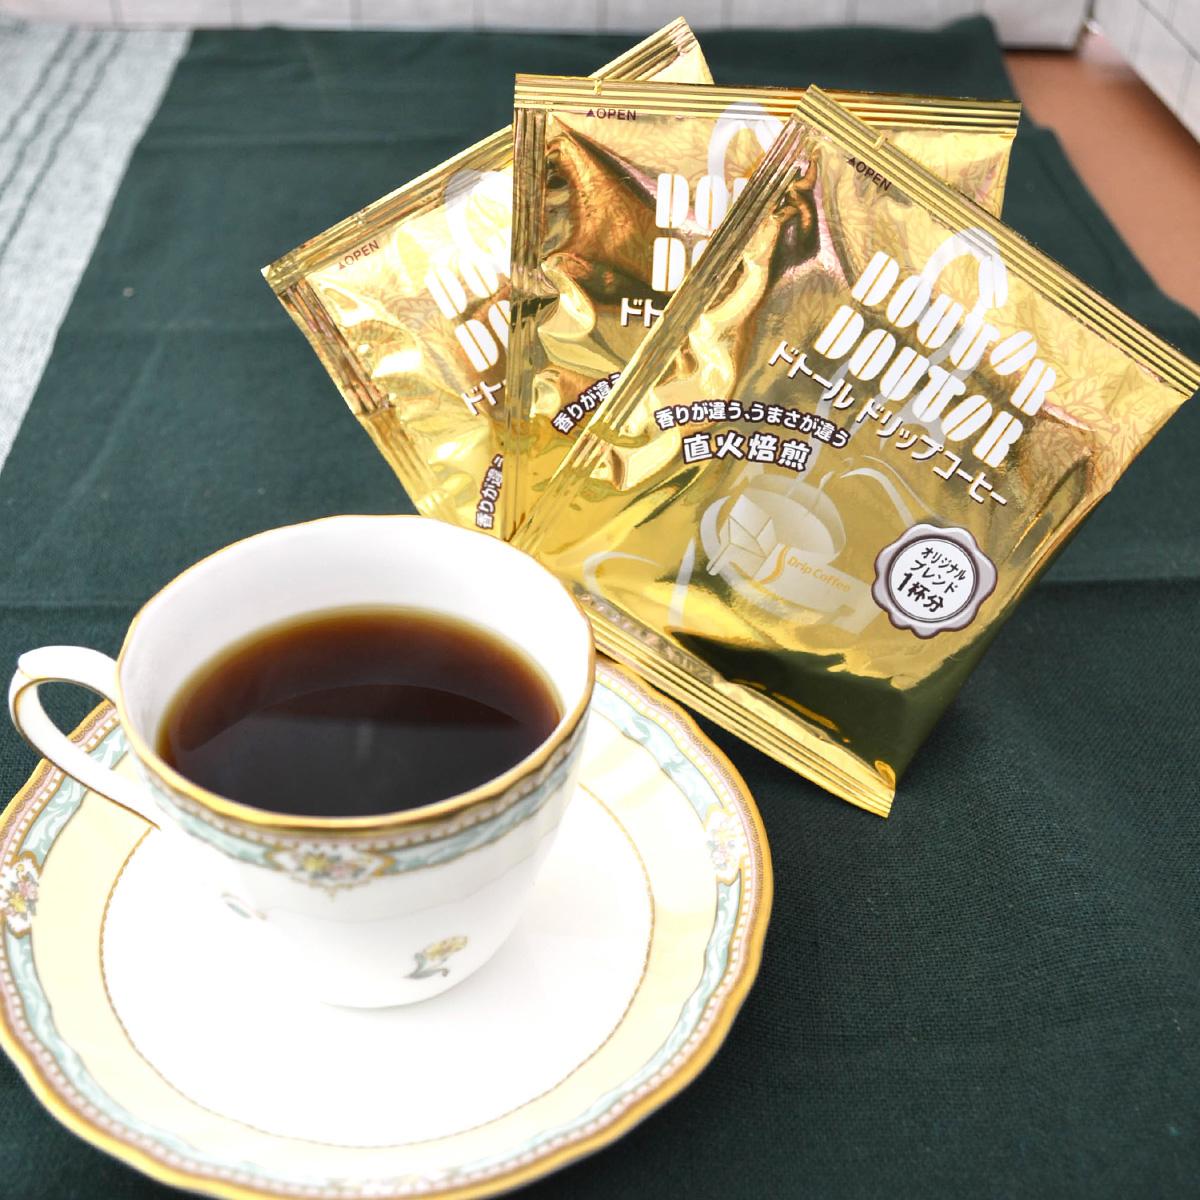 cafe etoile ドトールコーヒー&バウムクーヘンセットA〔ドリップコーヒー×4・洋菓子2種全6個〕